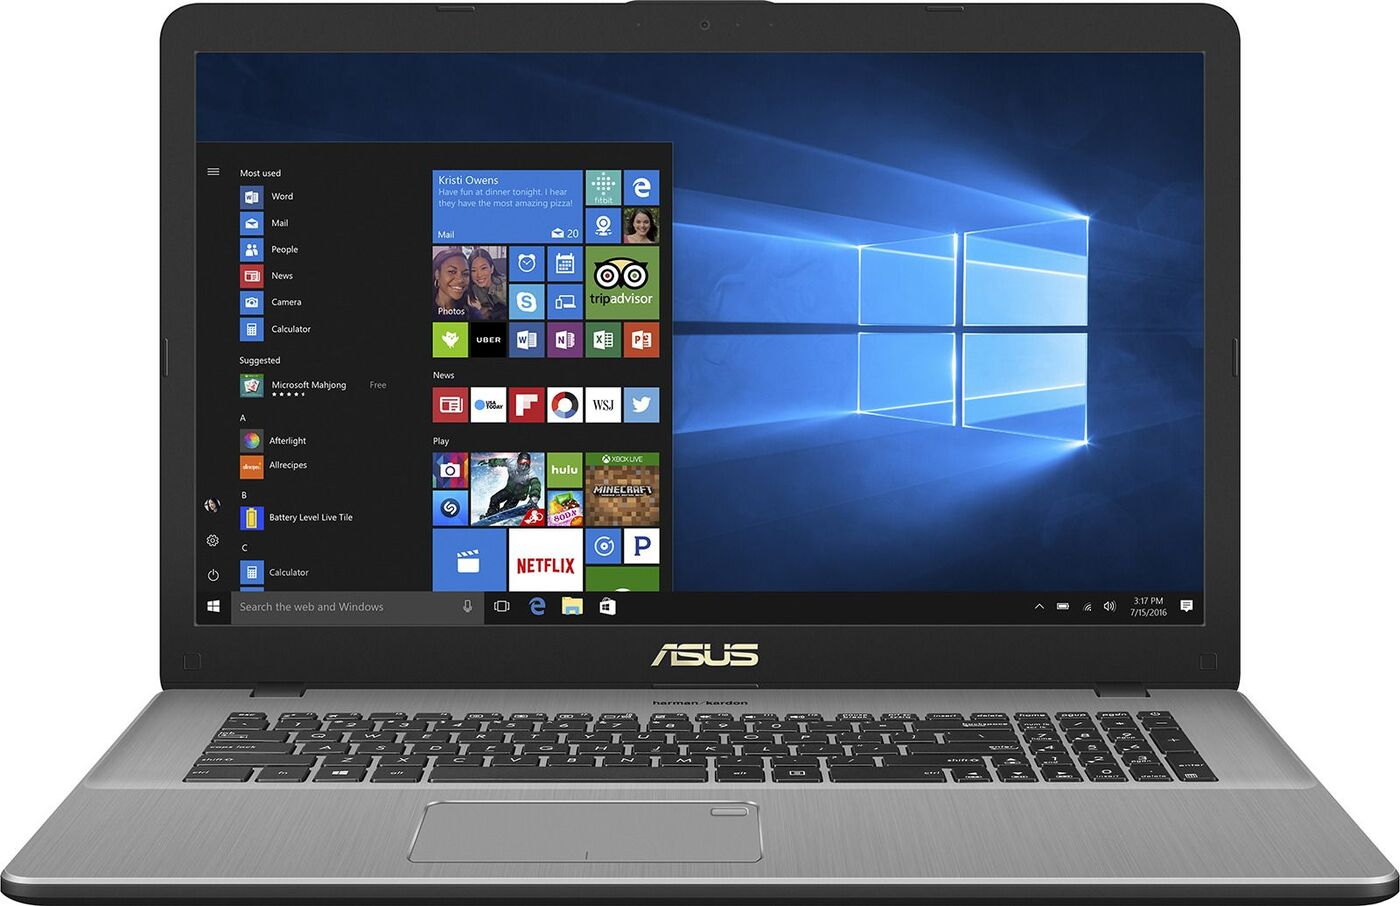 14 Ноутбук ASUS VivoBook S14 S410UA-BV1157T 90NB0GF2-M18740, серый ноутбук asus vivobook f402wa ga019t 90nb0hc3 m02680